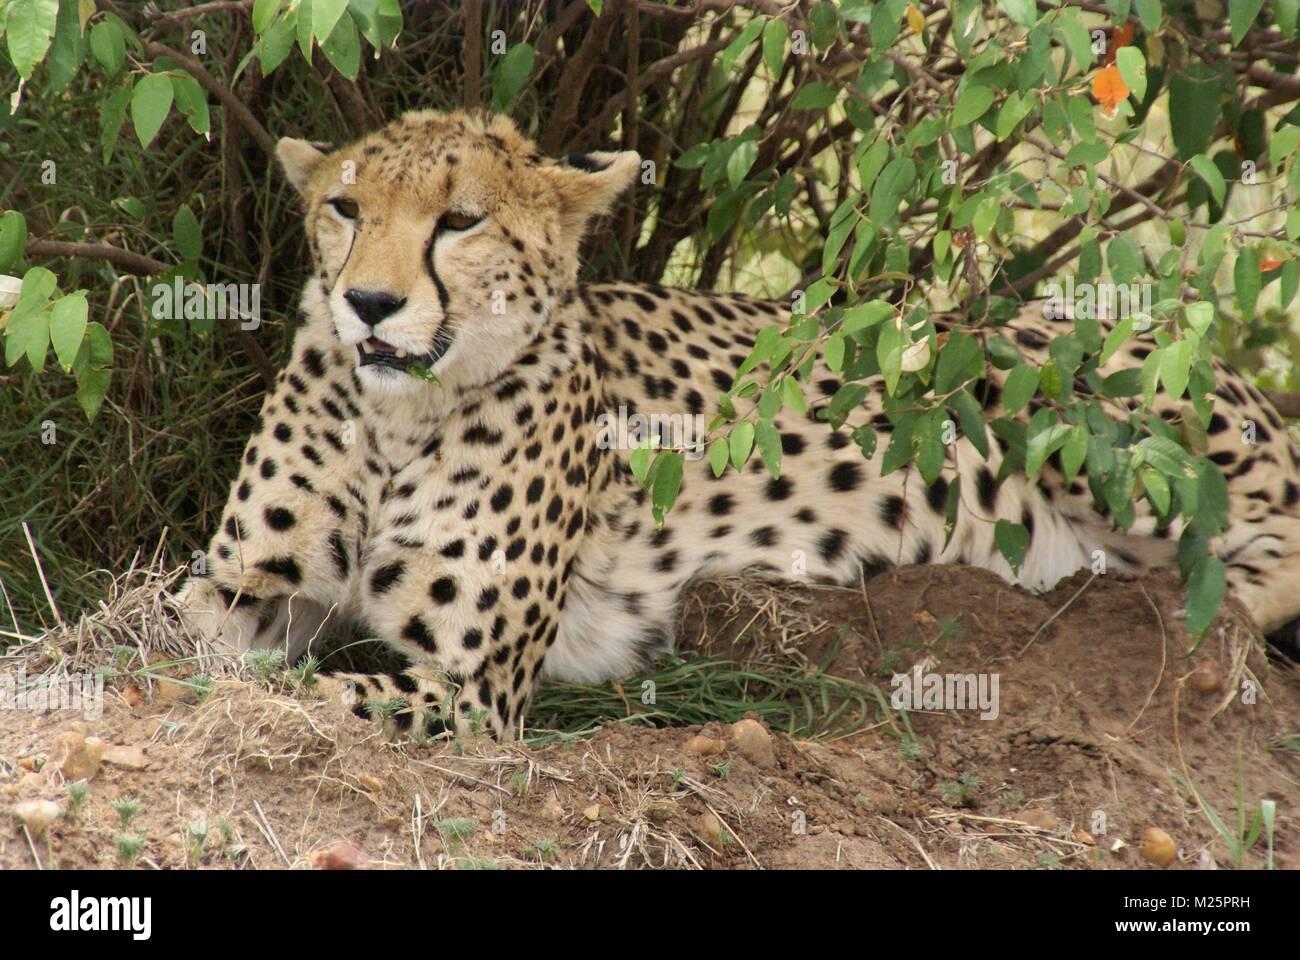 cheetah safari kenya south africa Stock Photo